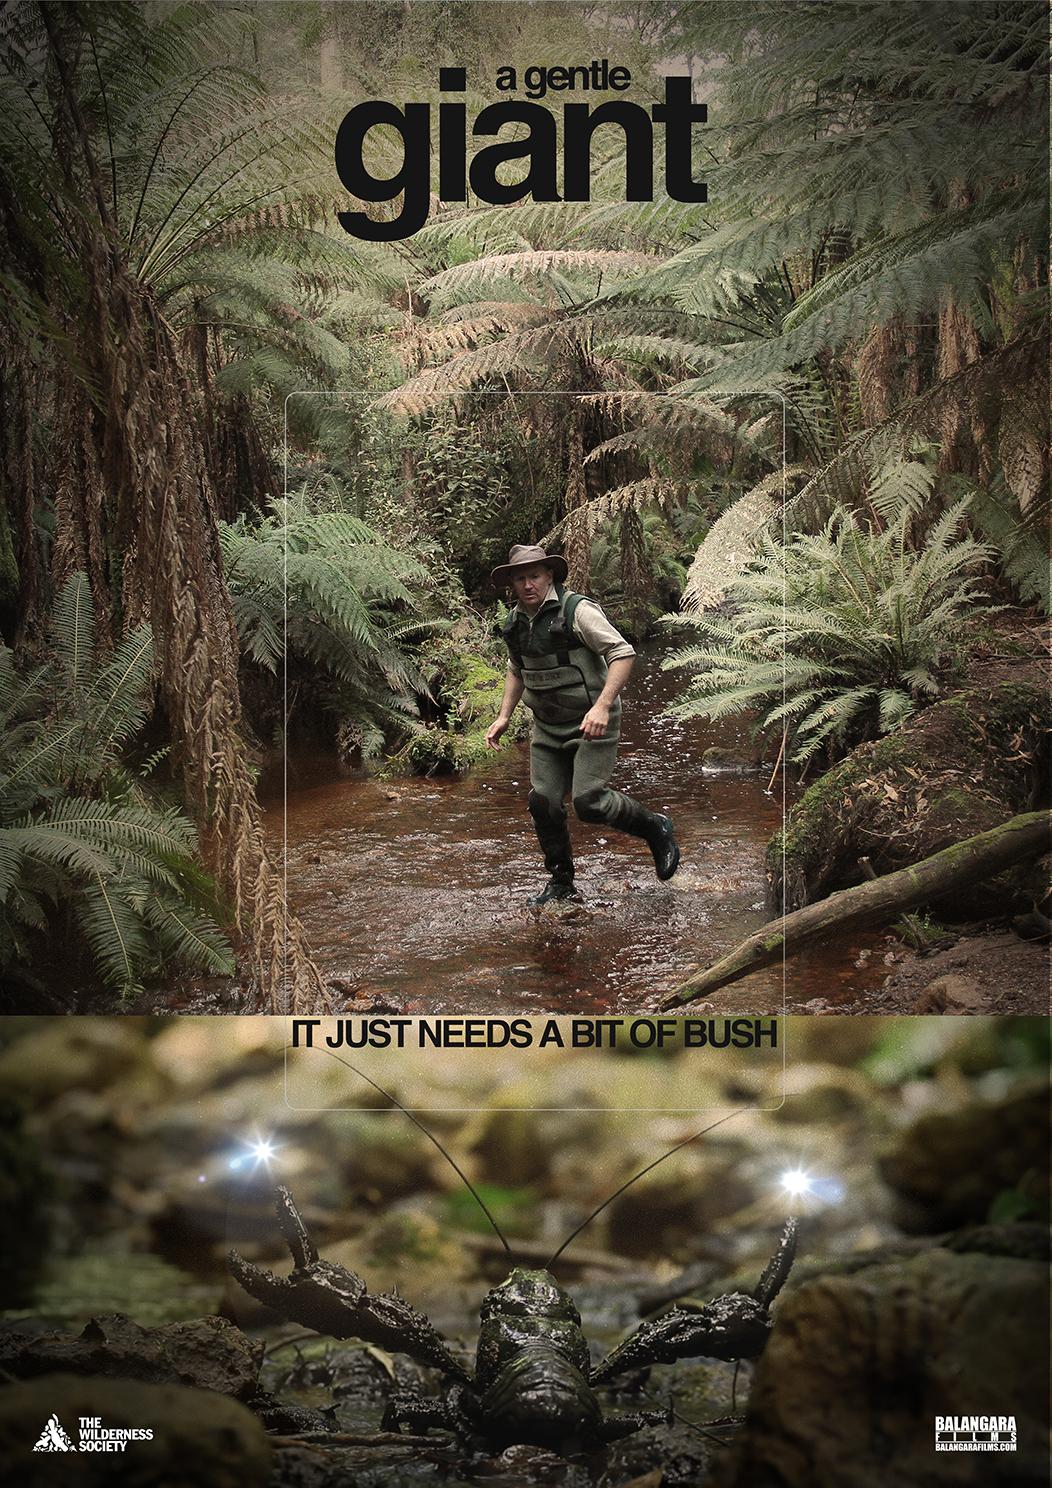 """A Gentle Giant""   It just needs a bit of bush.  Genre: Documentary   Dur: 4min"